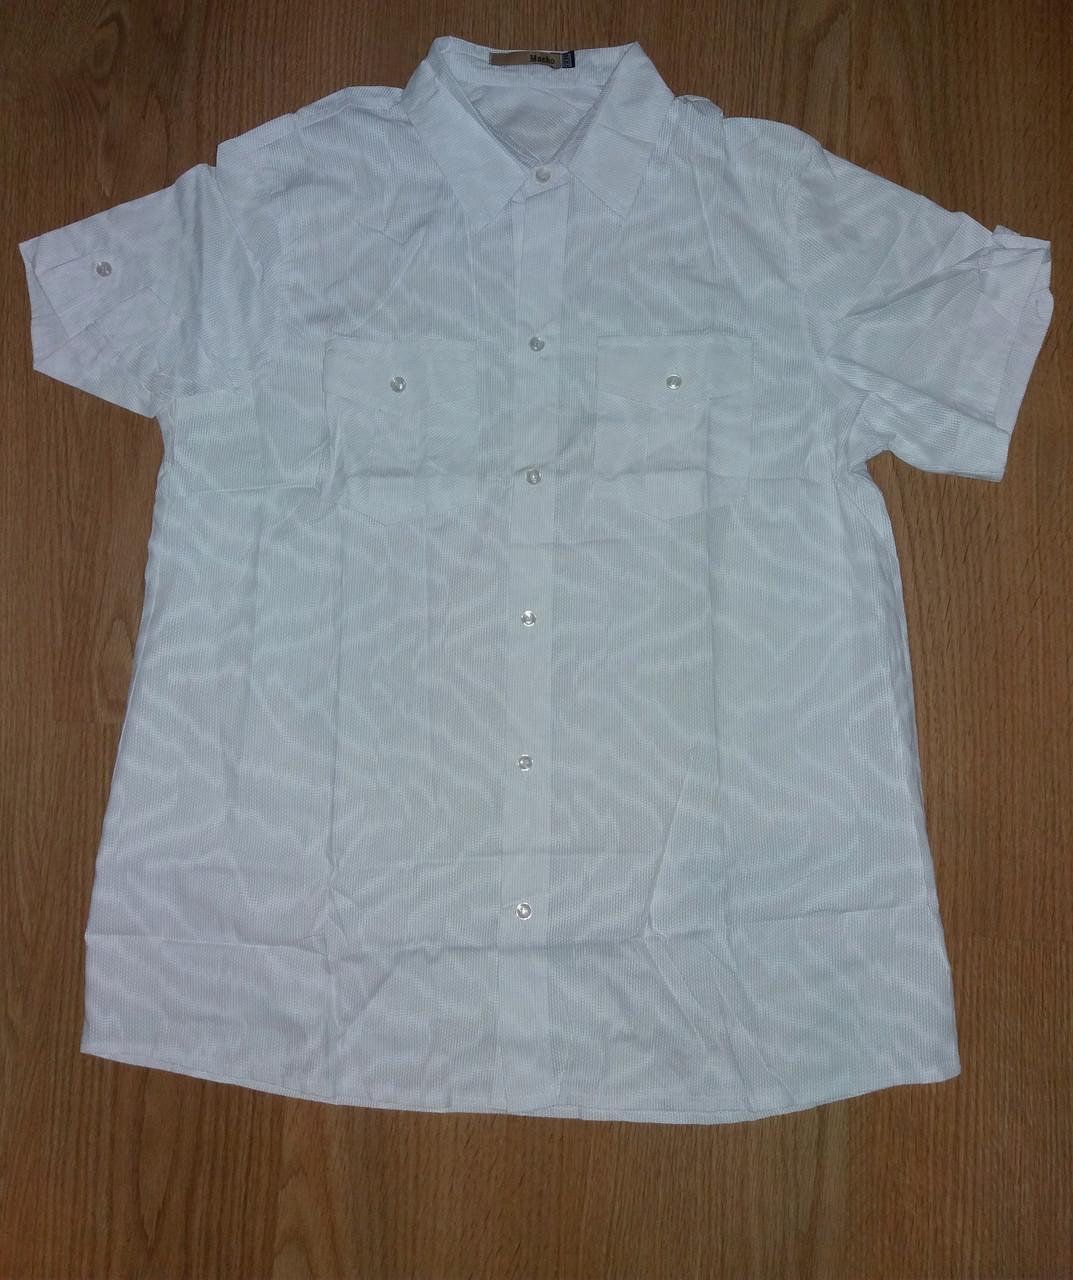 Мужская рубашка с коротким рукавом белая р.XXL (52) Турция